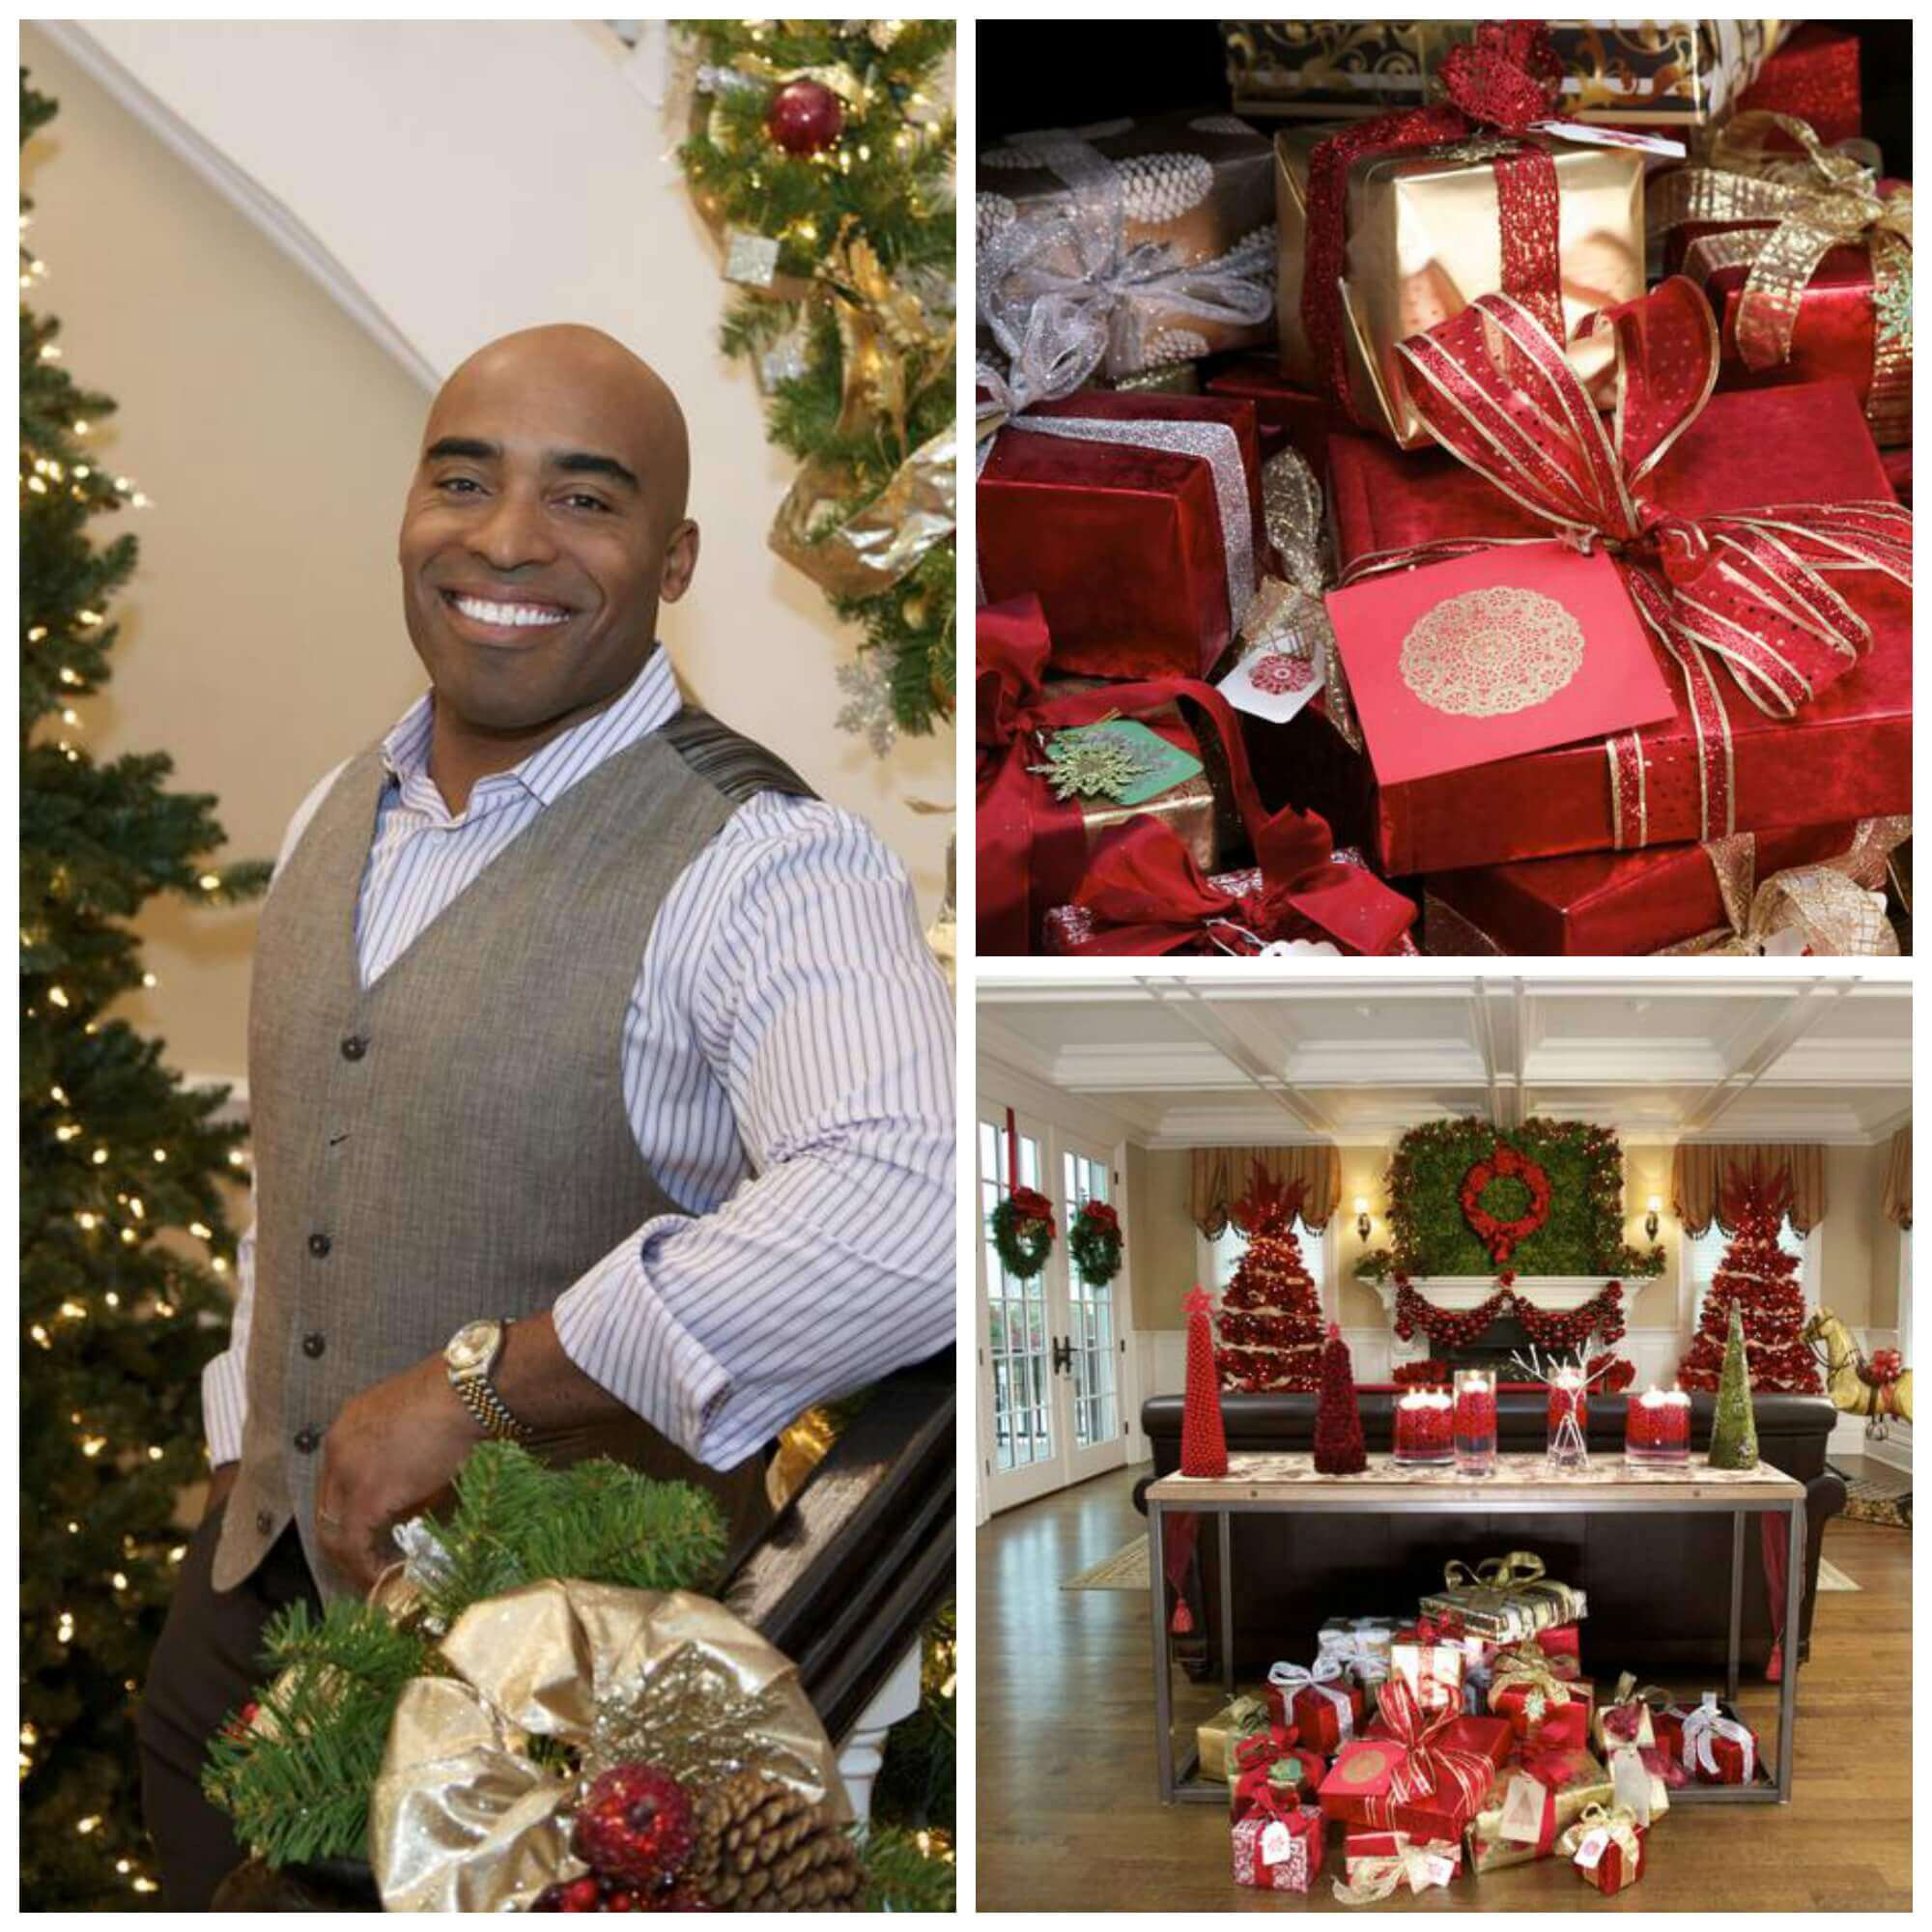 hgtv tiki barber 2013 - Celebrities Christmas Decorated Homes